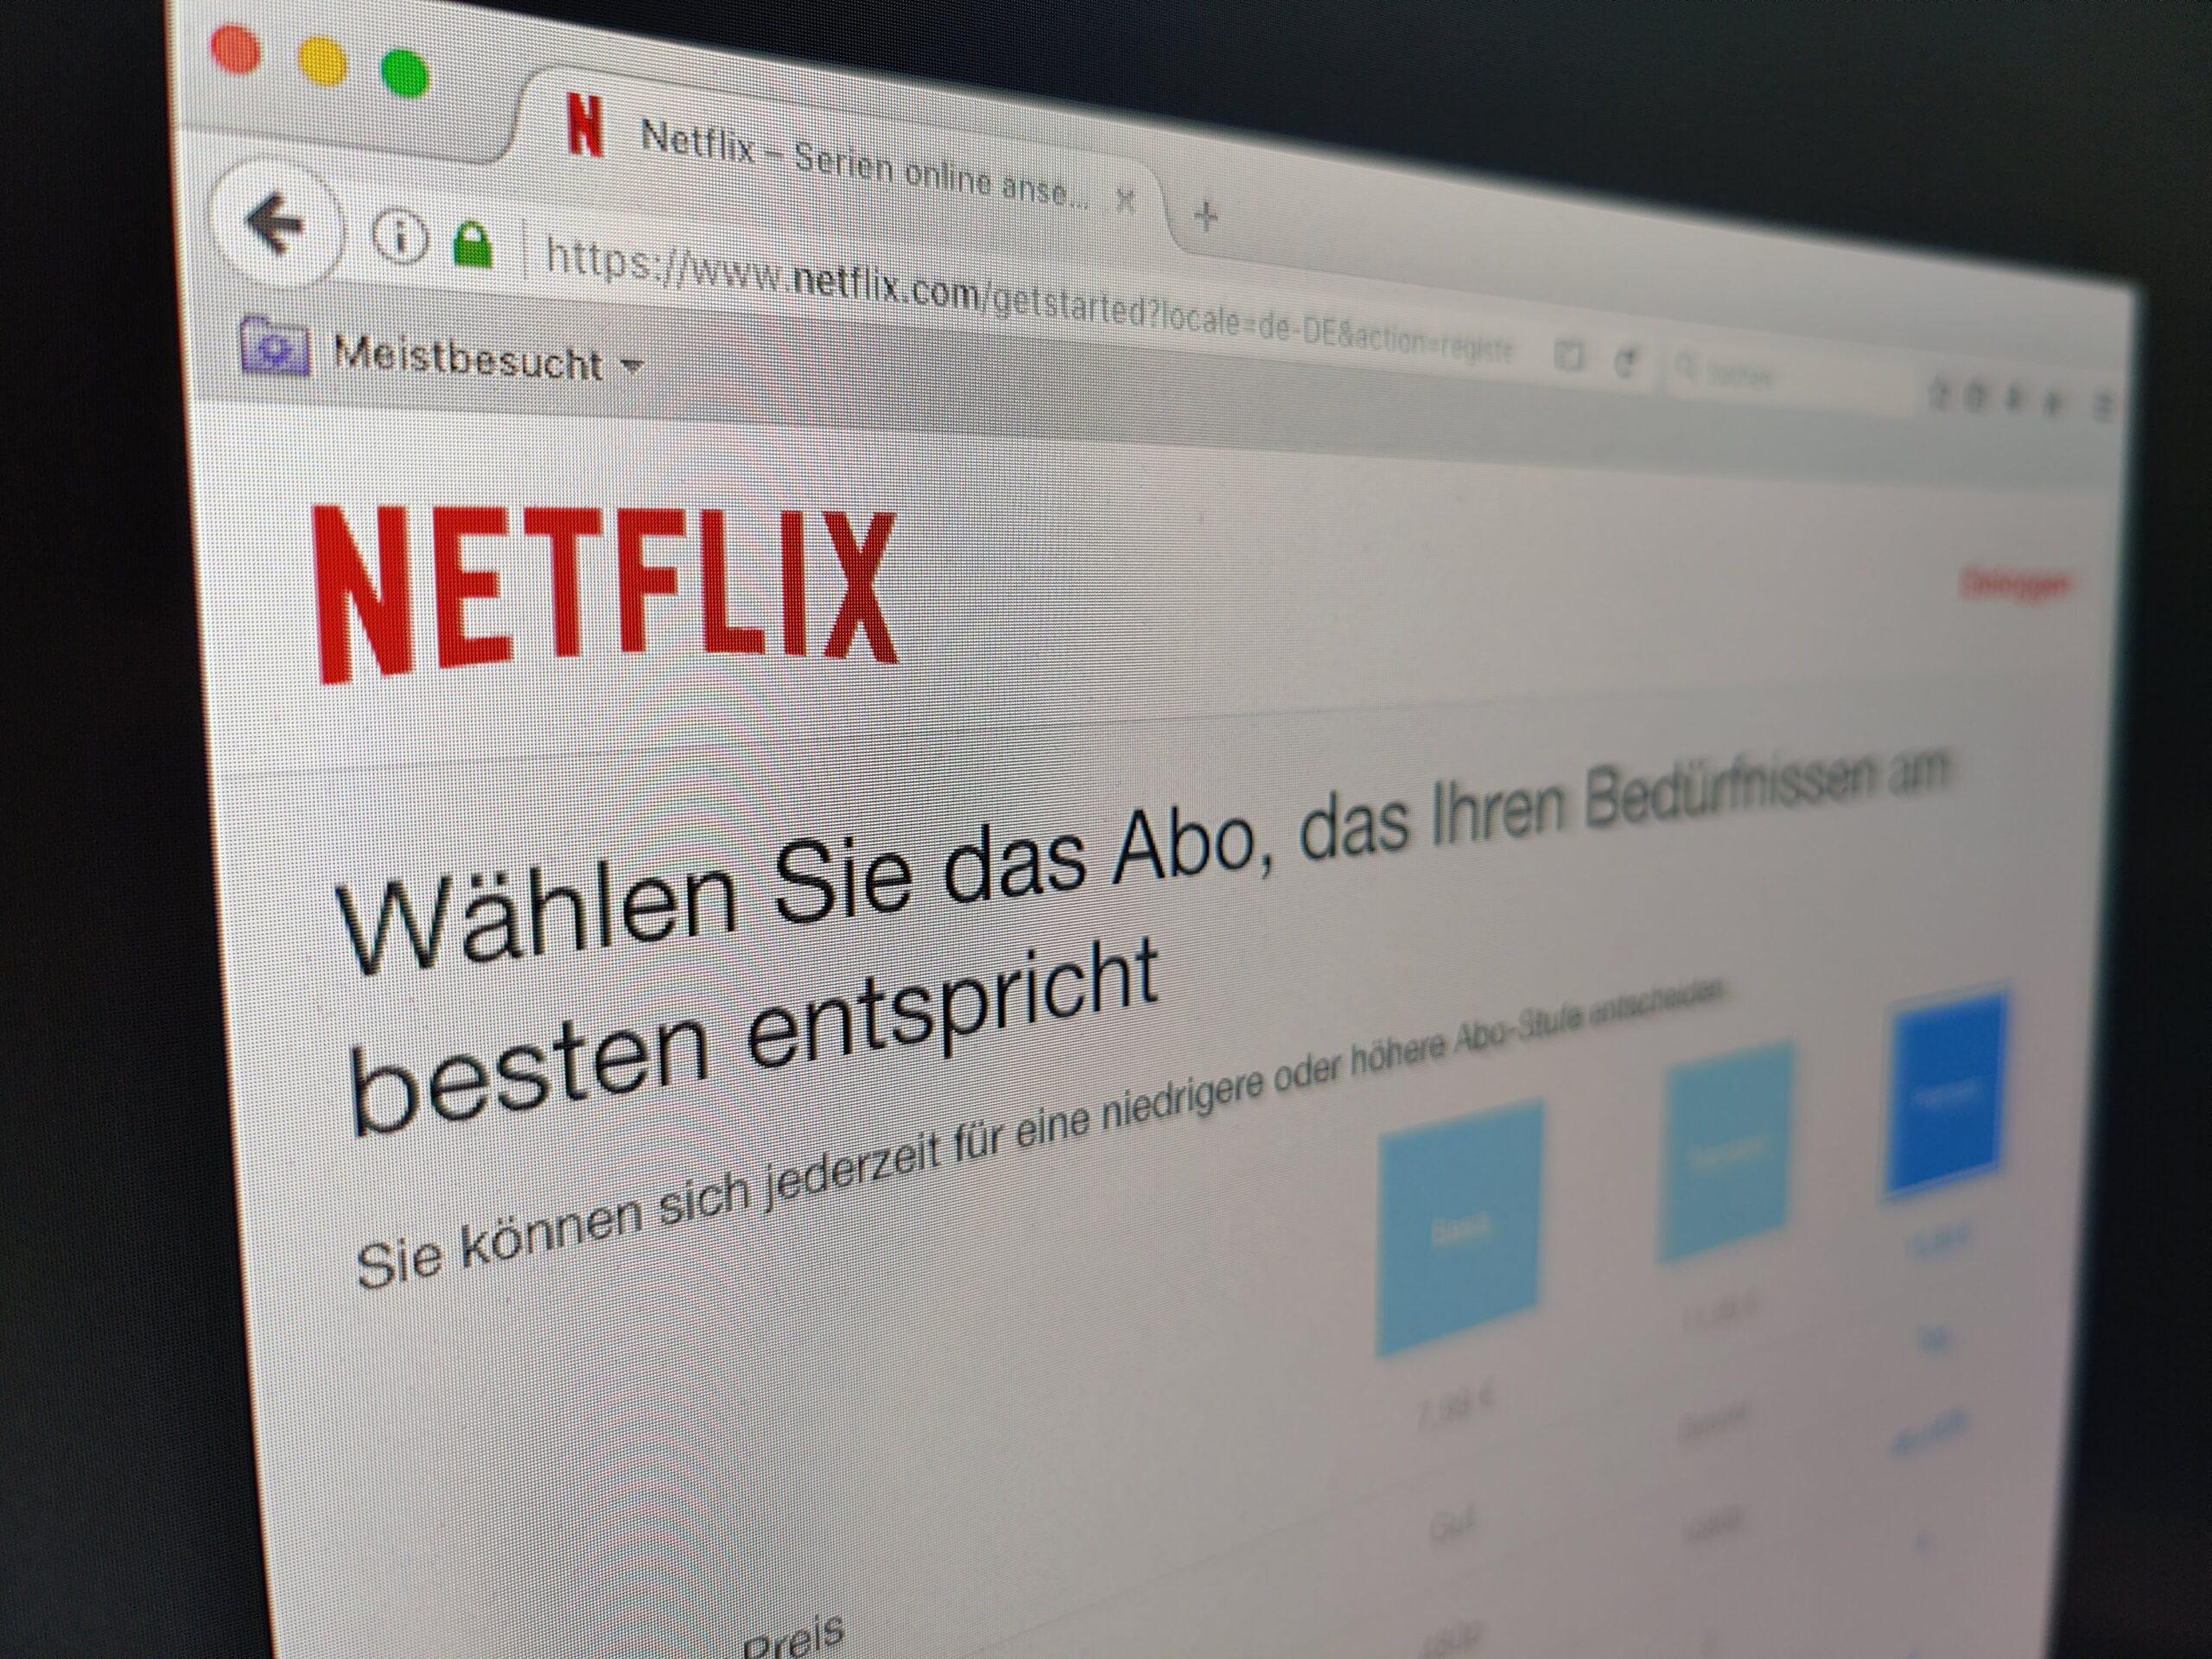 Netflix Neuheiten - cover